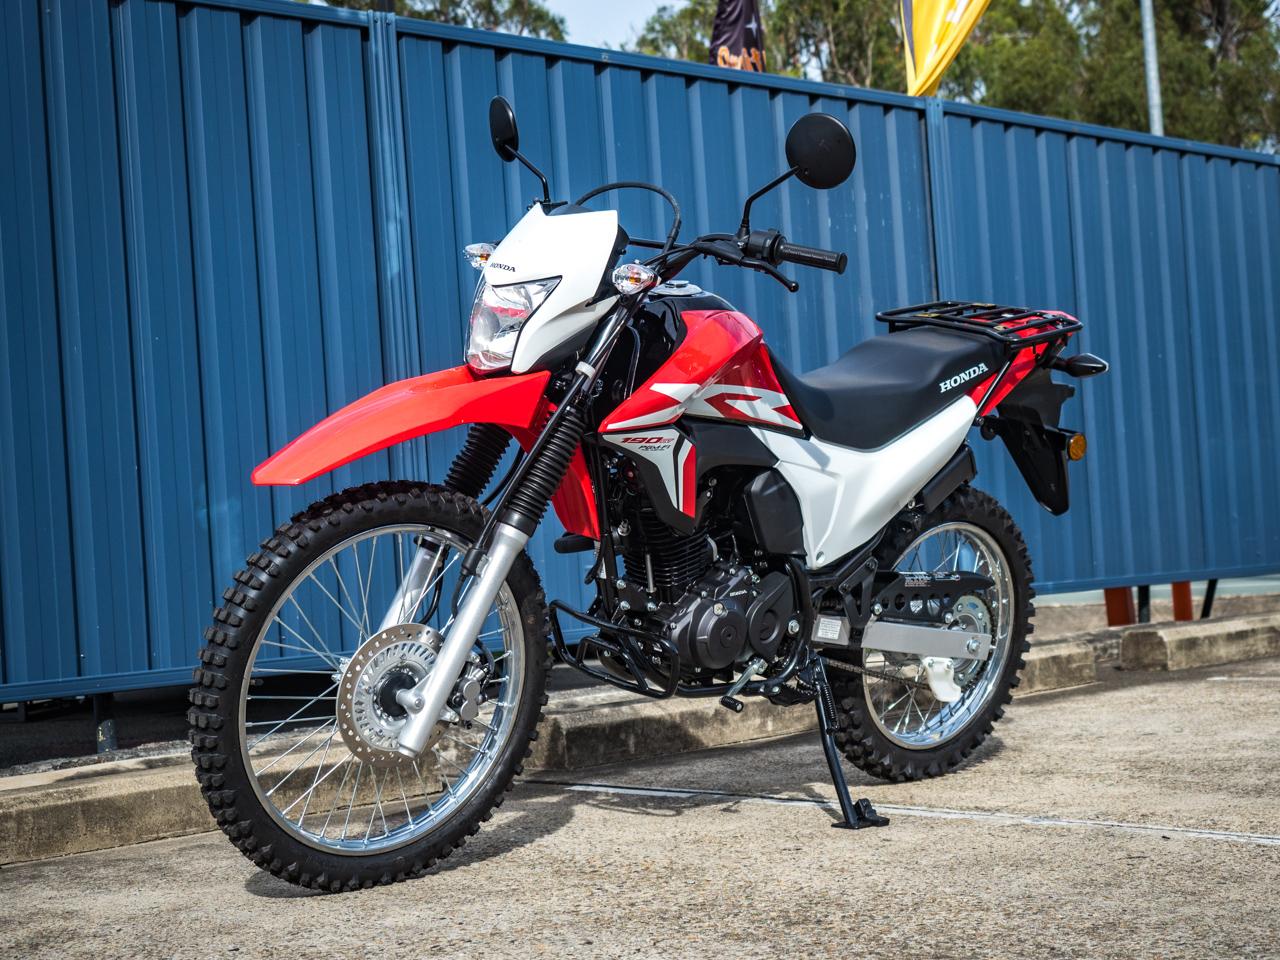 Honda XR190CT AG-XR ADR 2017 - Red ⋆ Motorcycles R Us